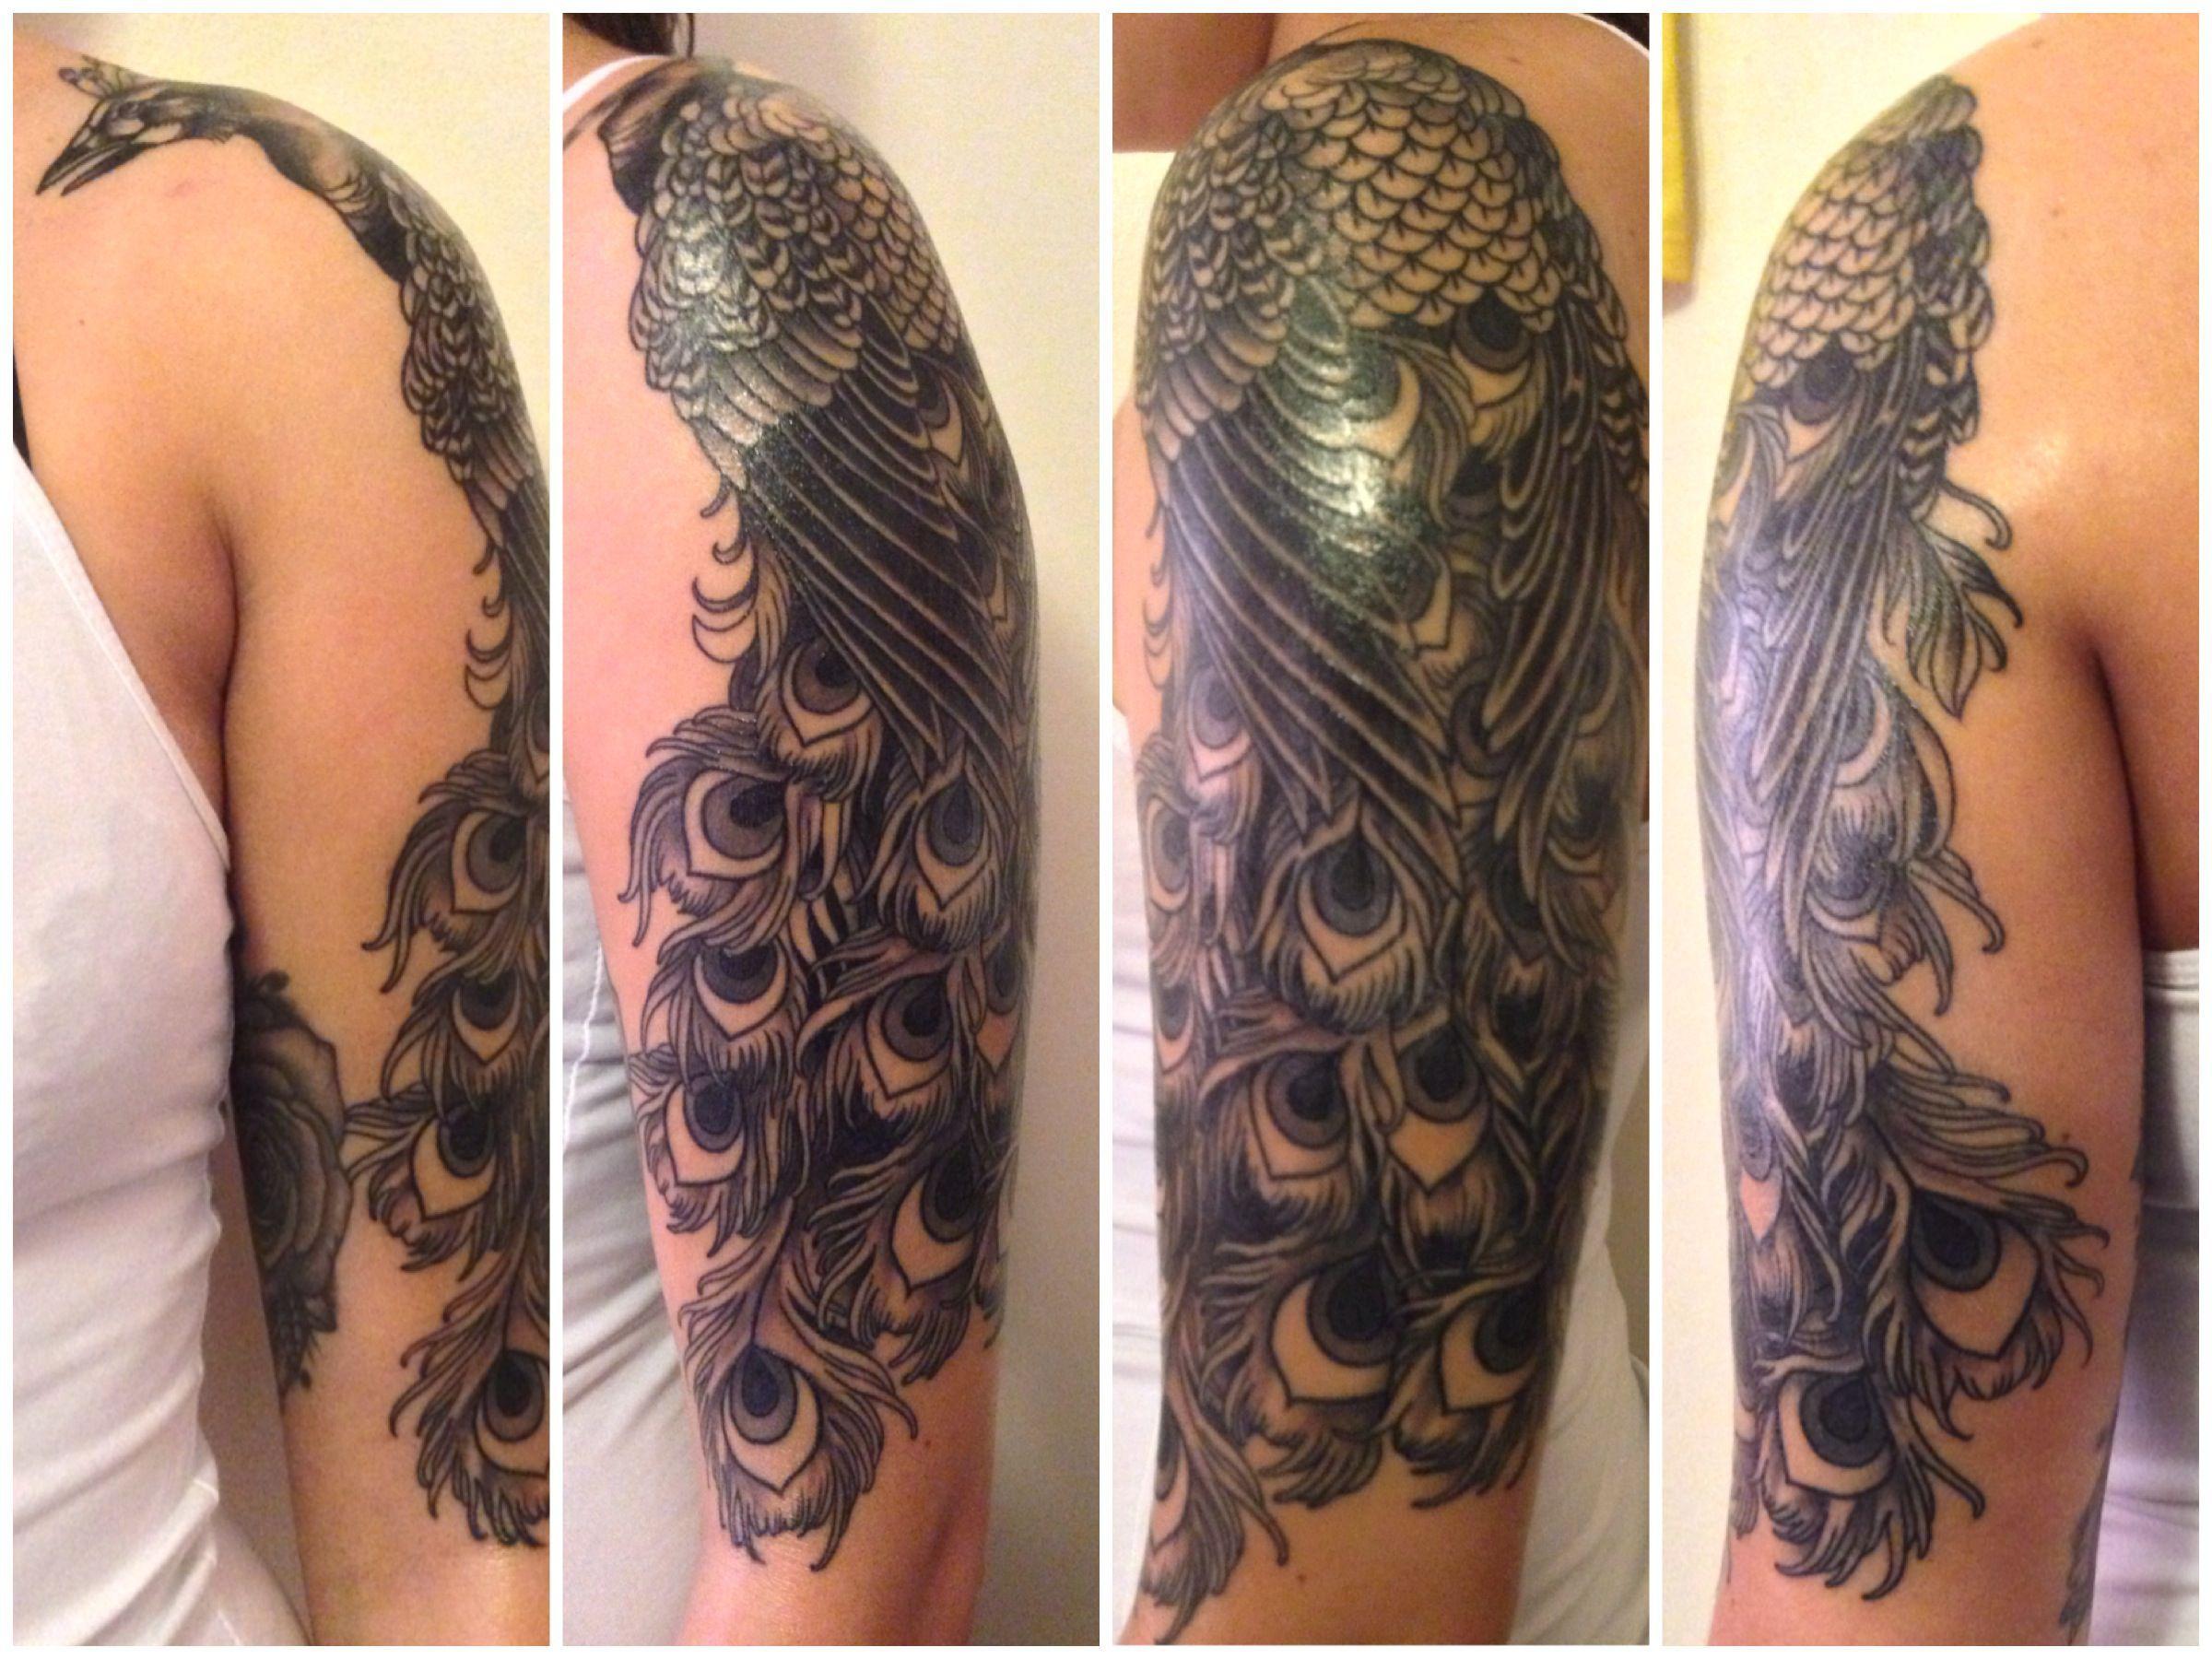 By Tash at Ultimate Skin; Leeds, UK. Peacock, black & gray